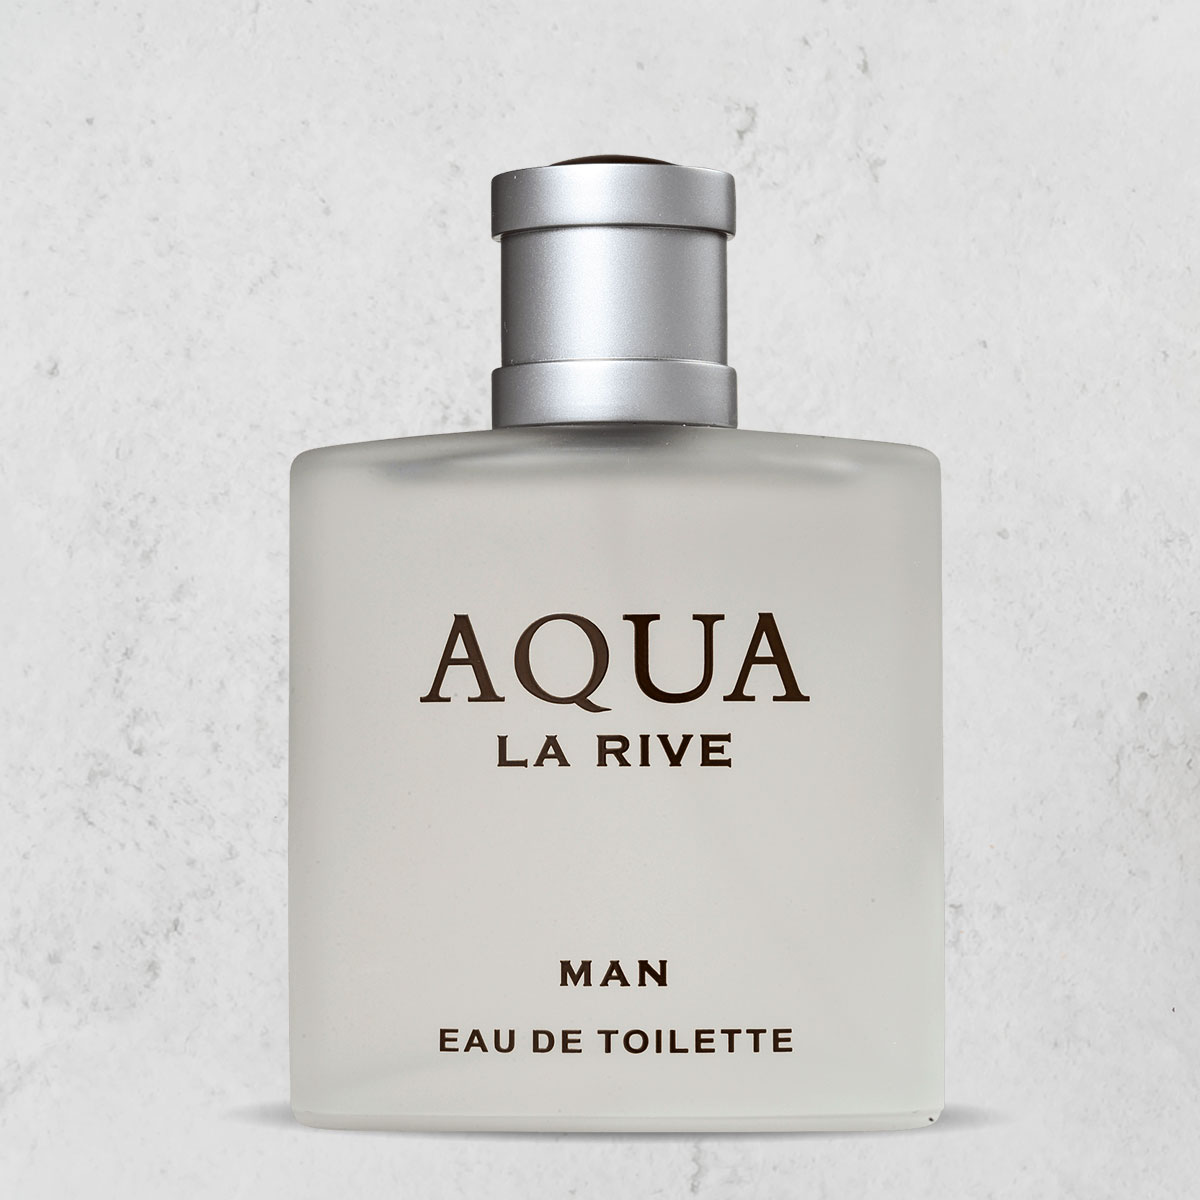 Kit 3 Perfumes Aqua Man La Rive 100ml Edt Masculino